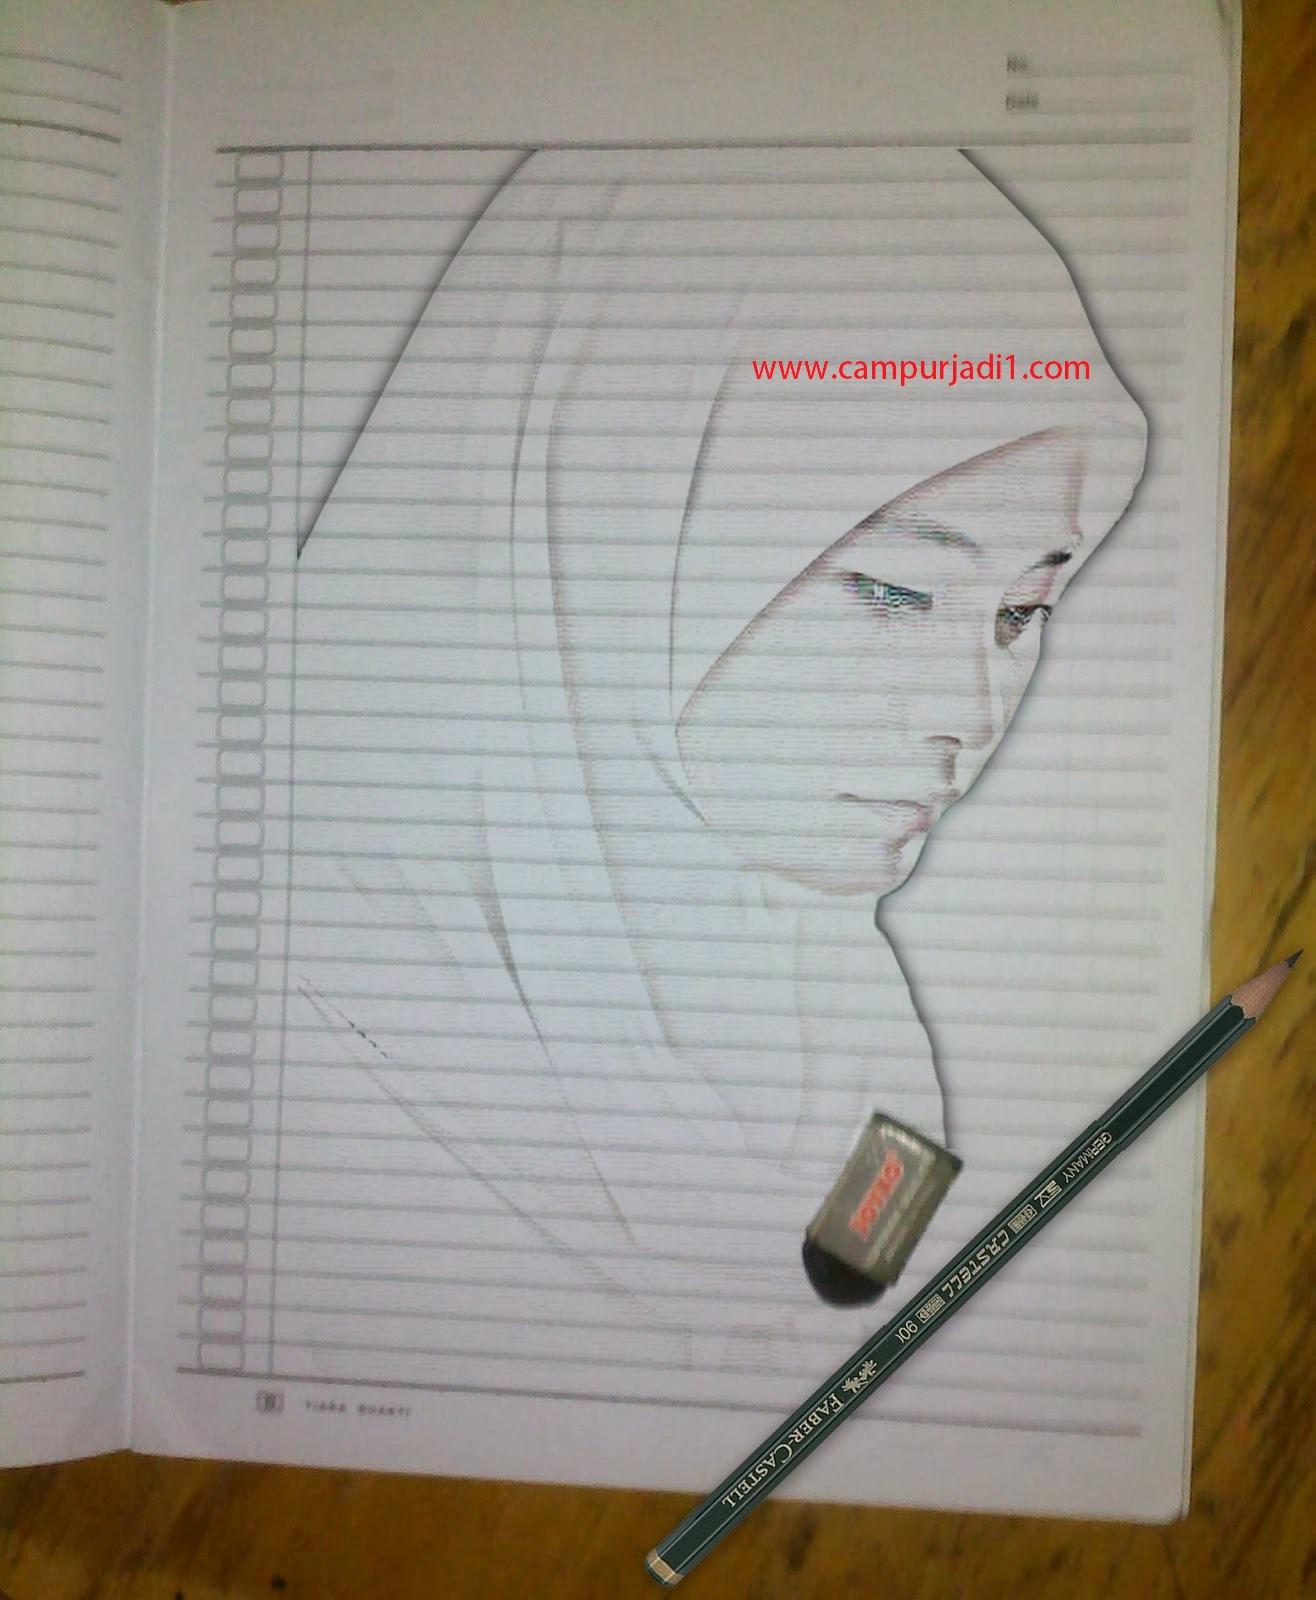 Gambar Sketsa Pensil Keren Sobsketsa